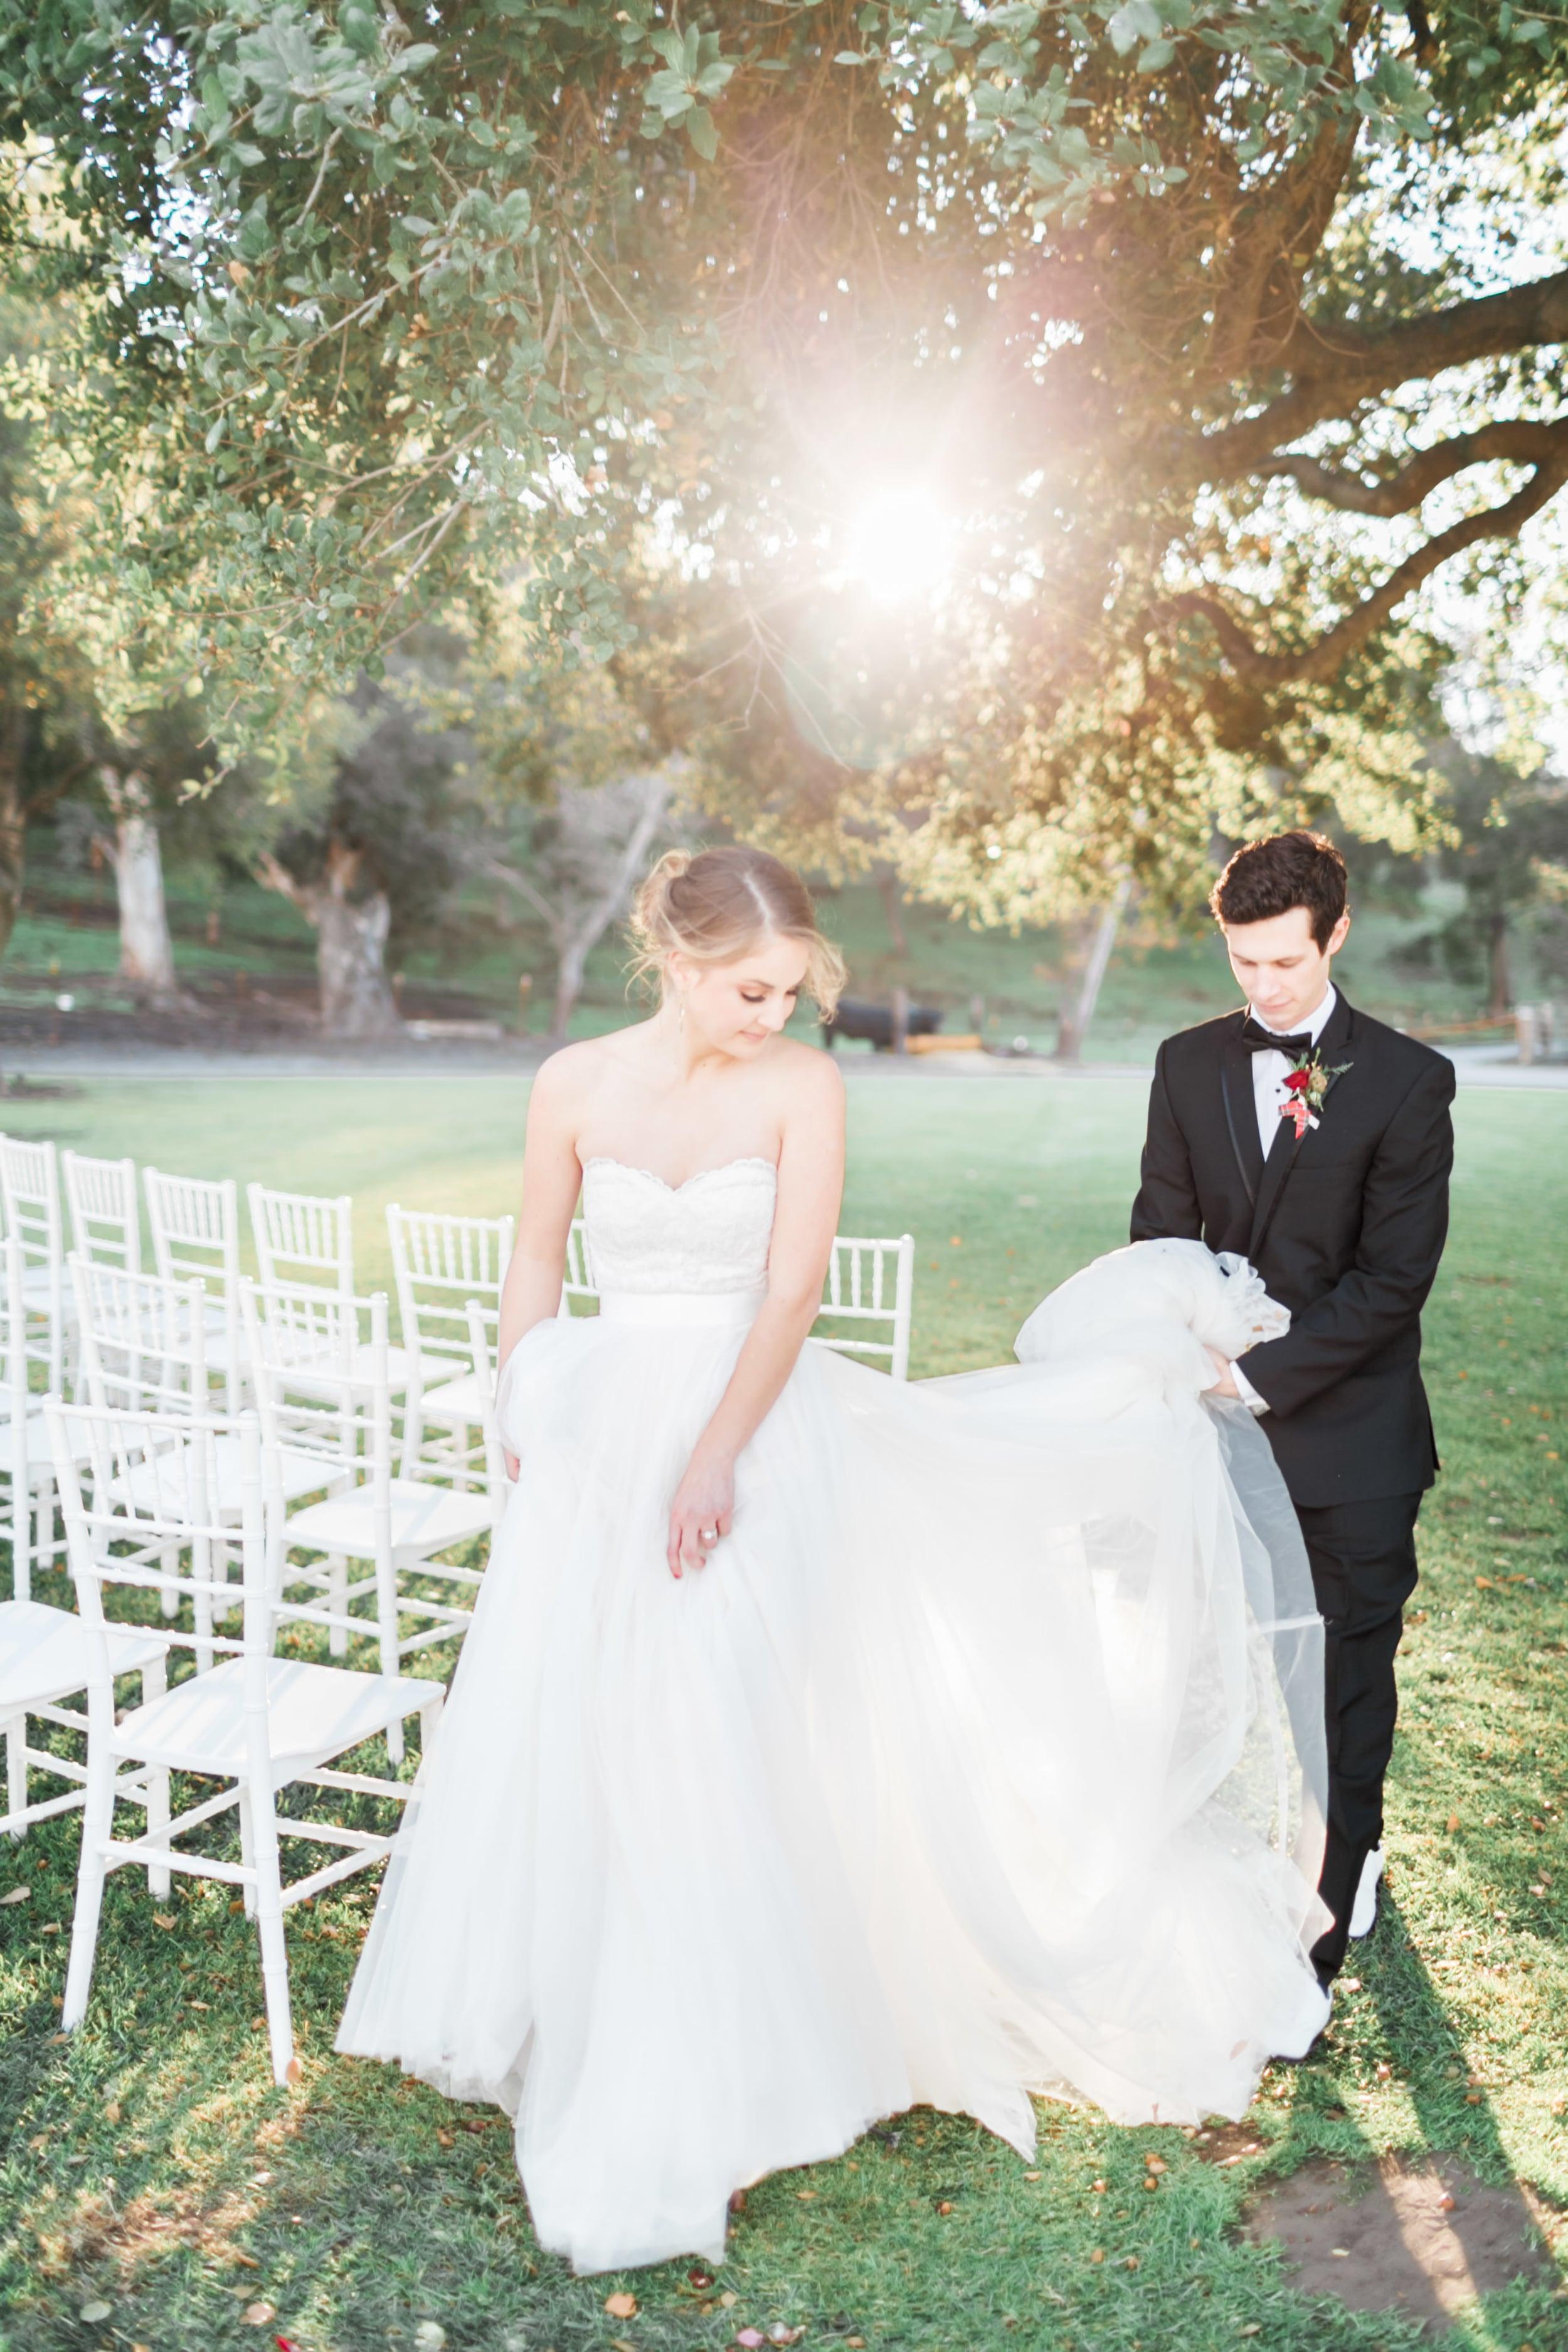 Natalie_Schutt_Photography_Winter_Wedding_San_Luis_Obispo-174.jpg